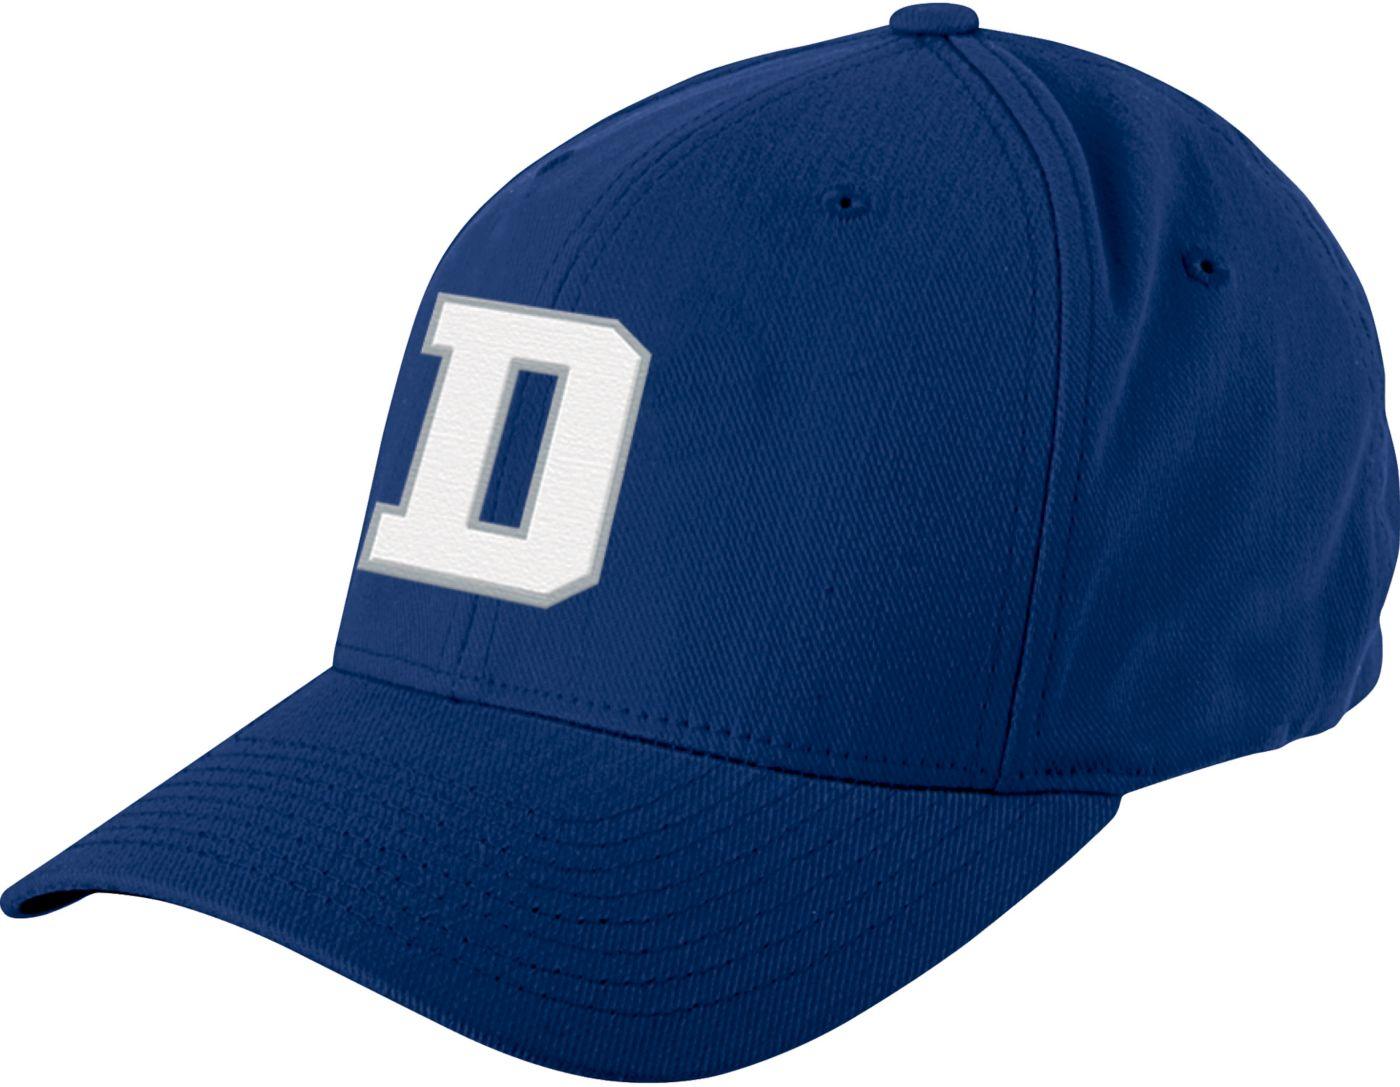 Dallas Cowboys Merchandising Men's Navy Coach's Flex Hat